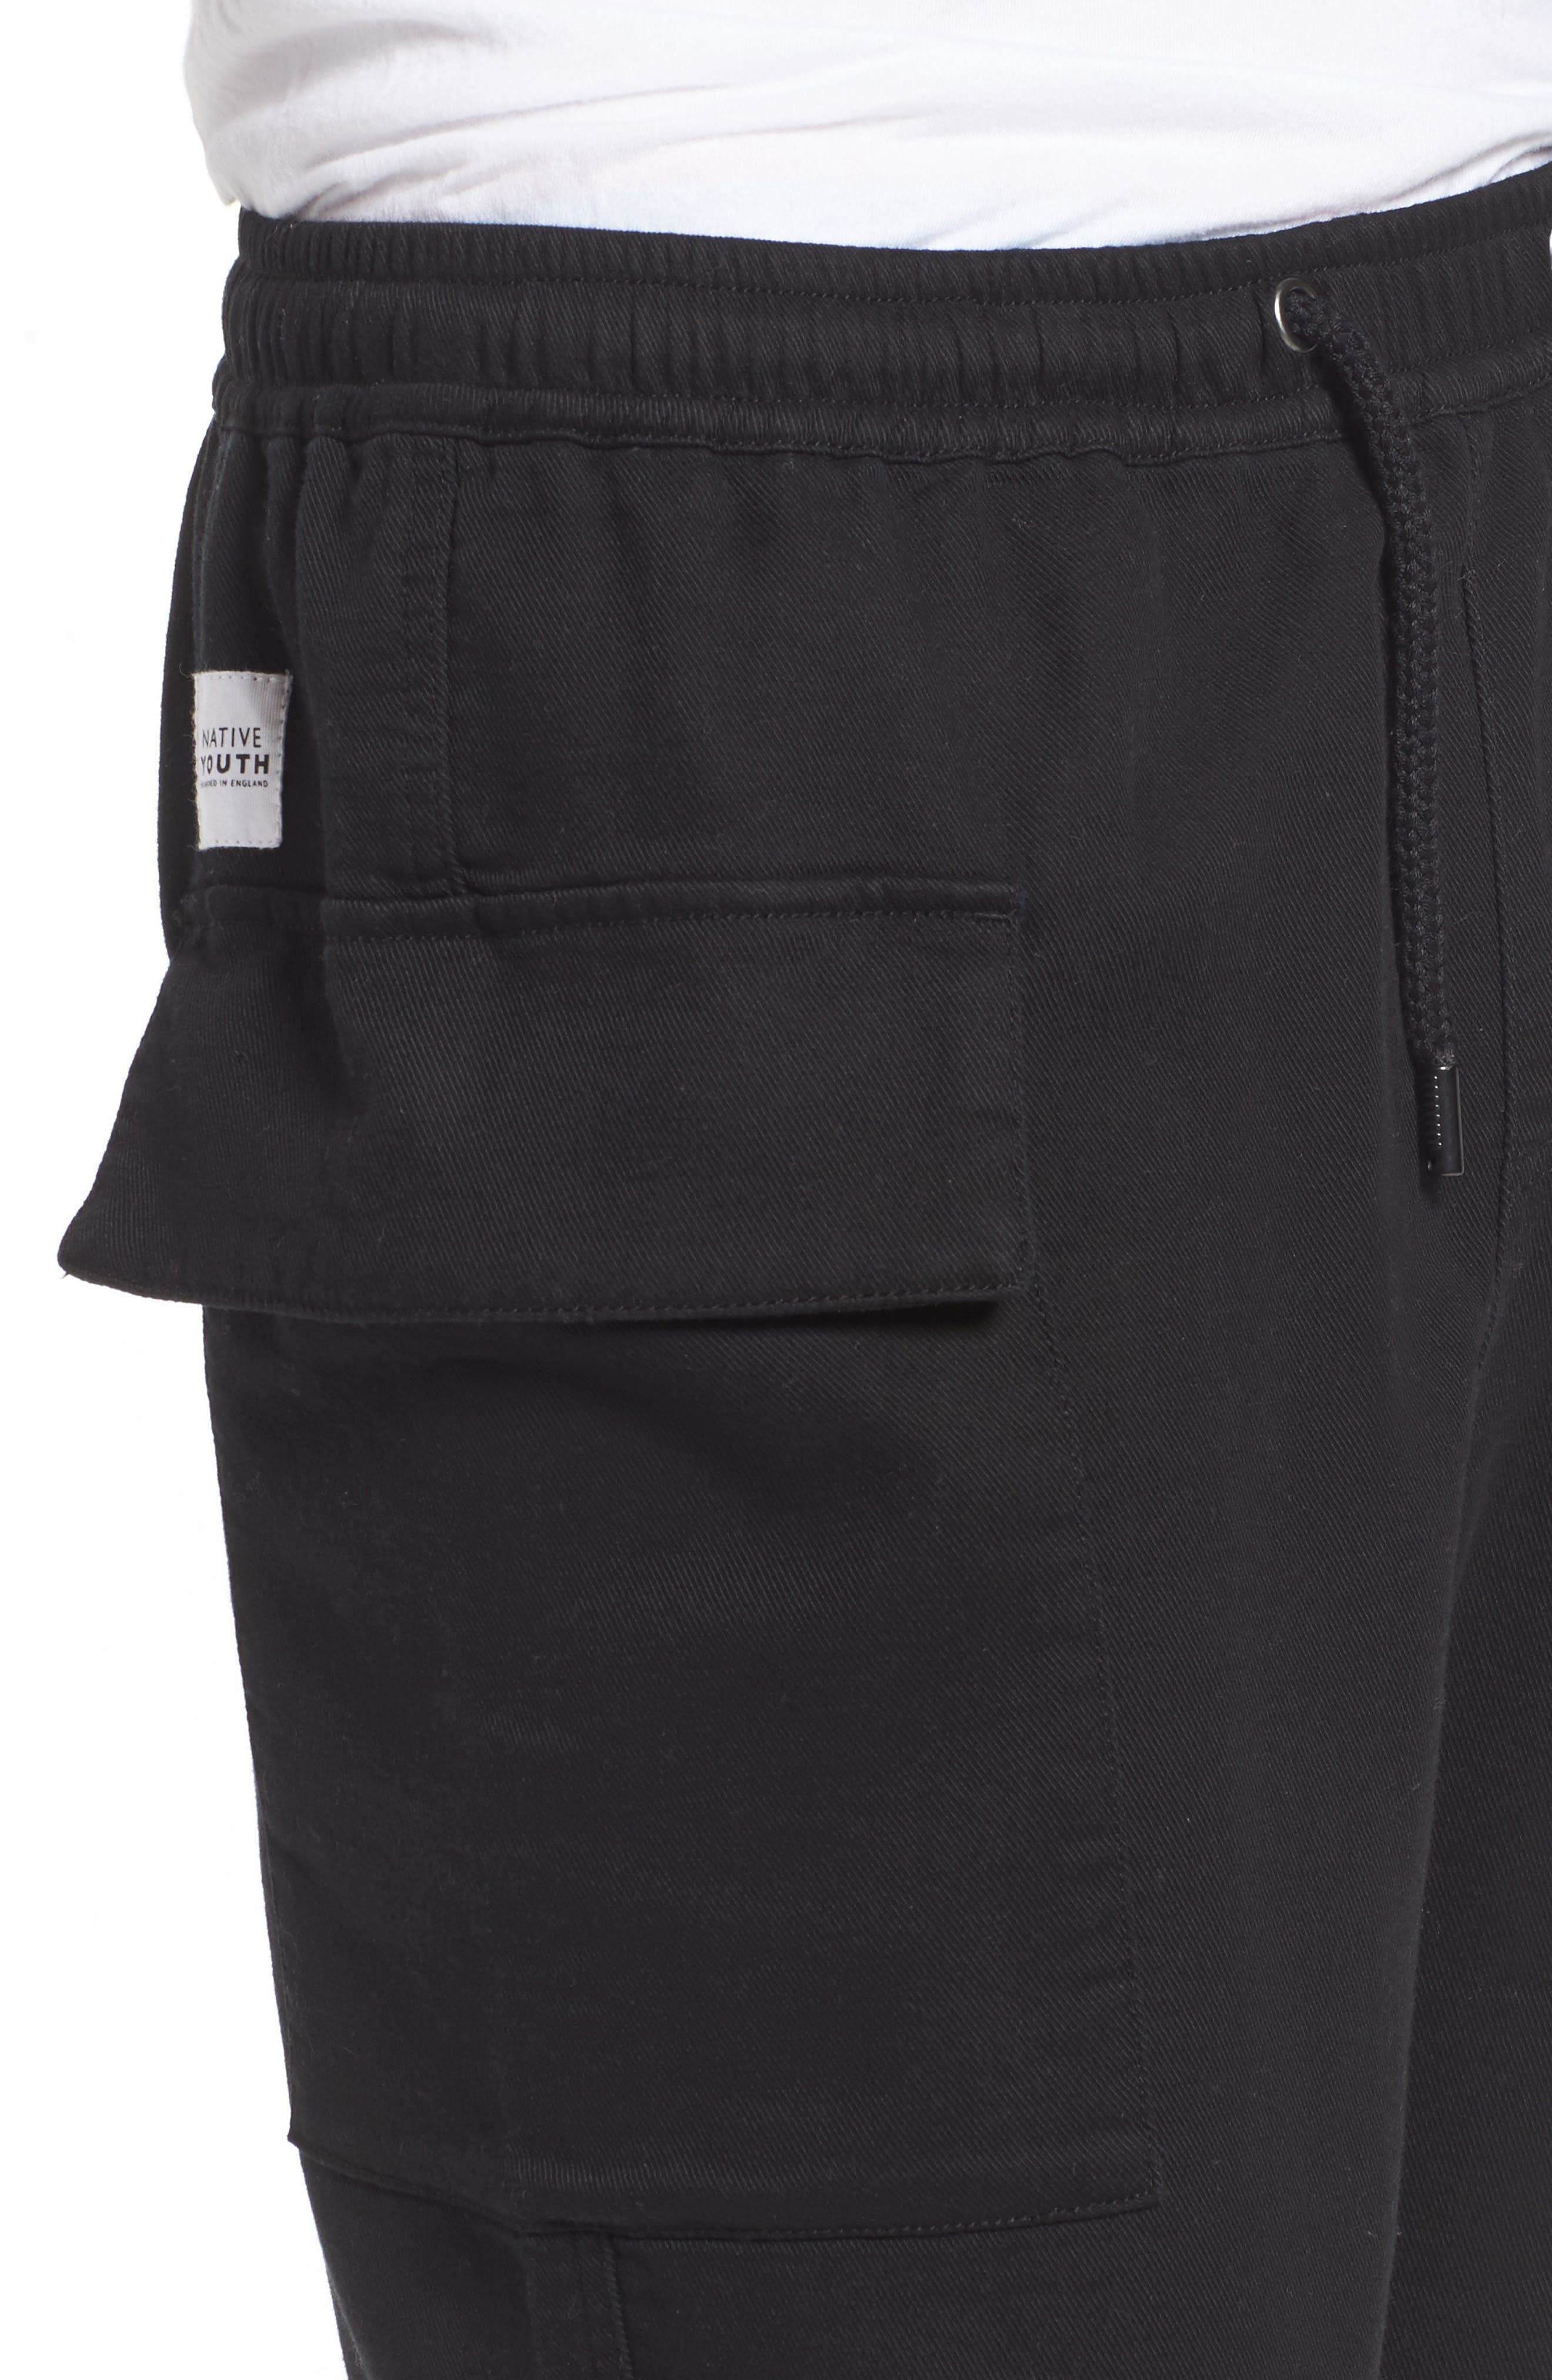 Shay Cargo Pants,                             Alternate thumbnail 4, color,                             001